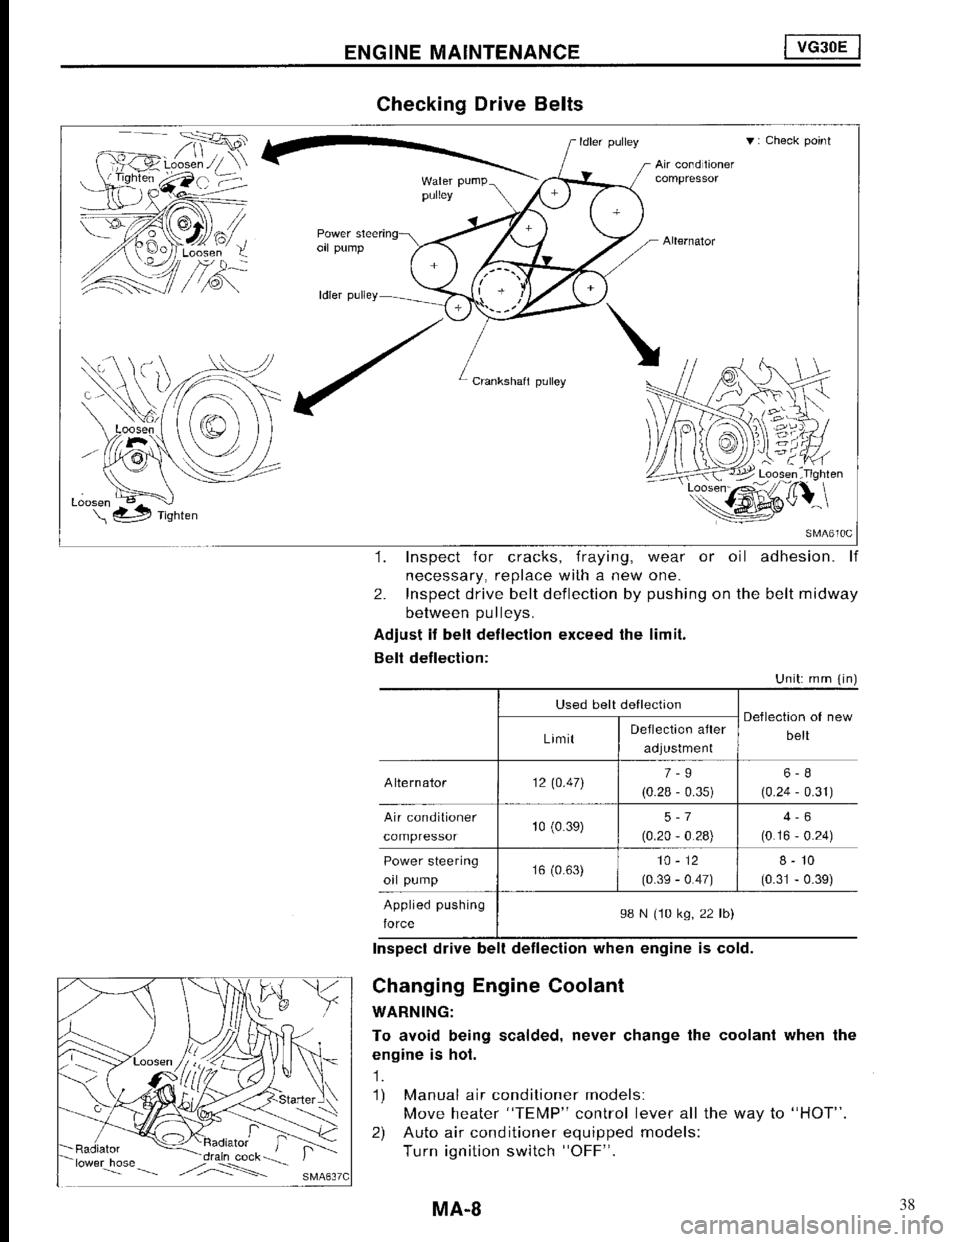 Nissan Maxima 1994 A32 4g Idler Pulley Diagram